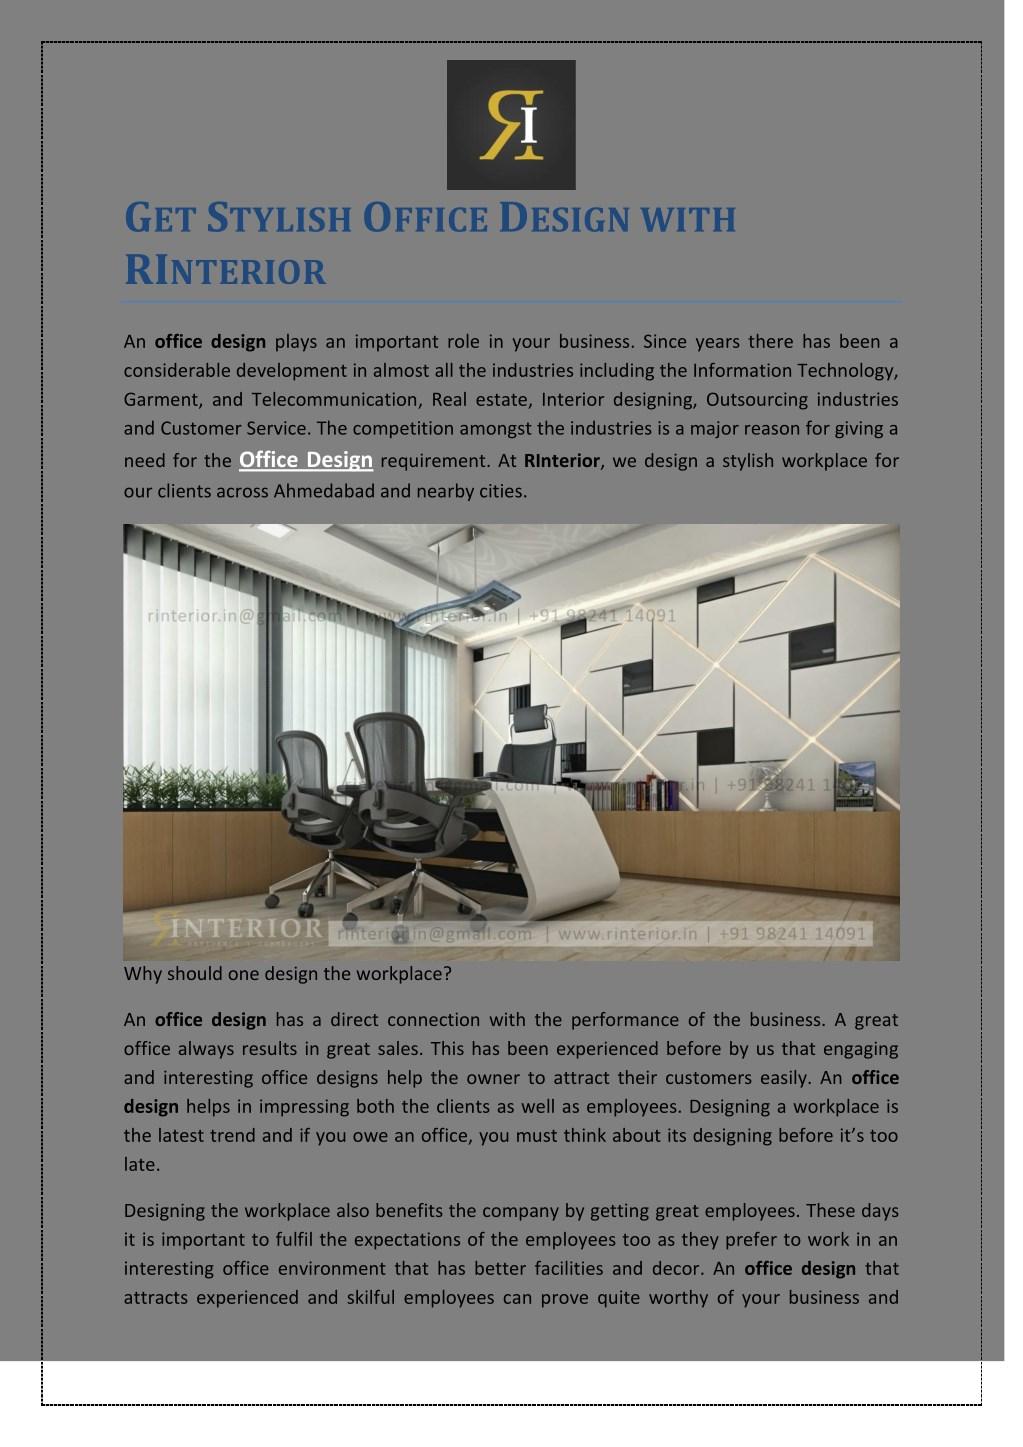 g et s tylish o ffice d esign with ri nterior n. & PPT - Get Stylish Office Design with RInterior PowerPoint ...